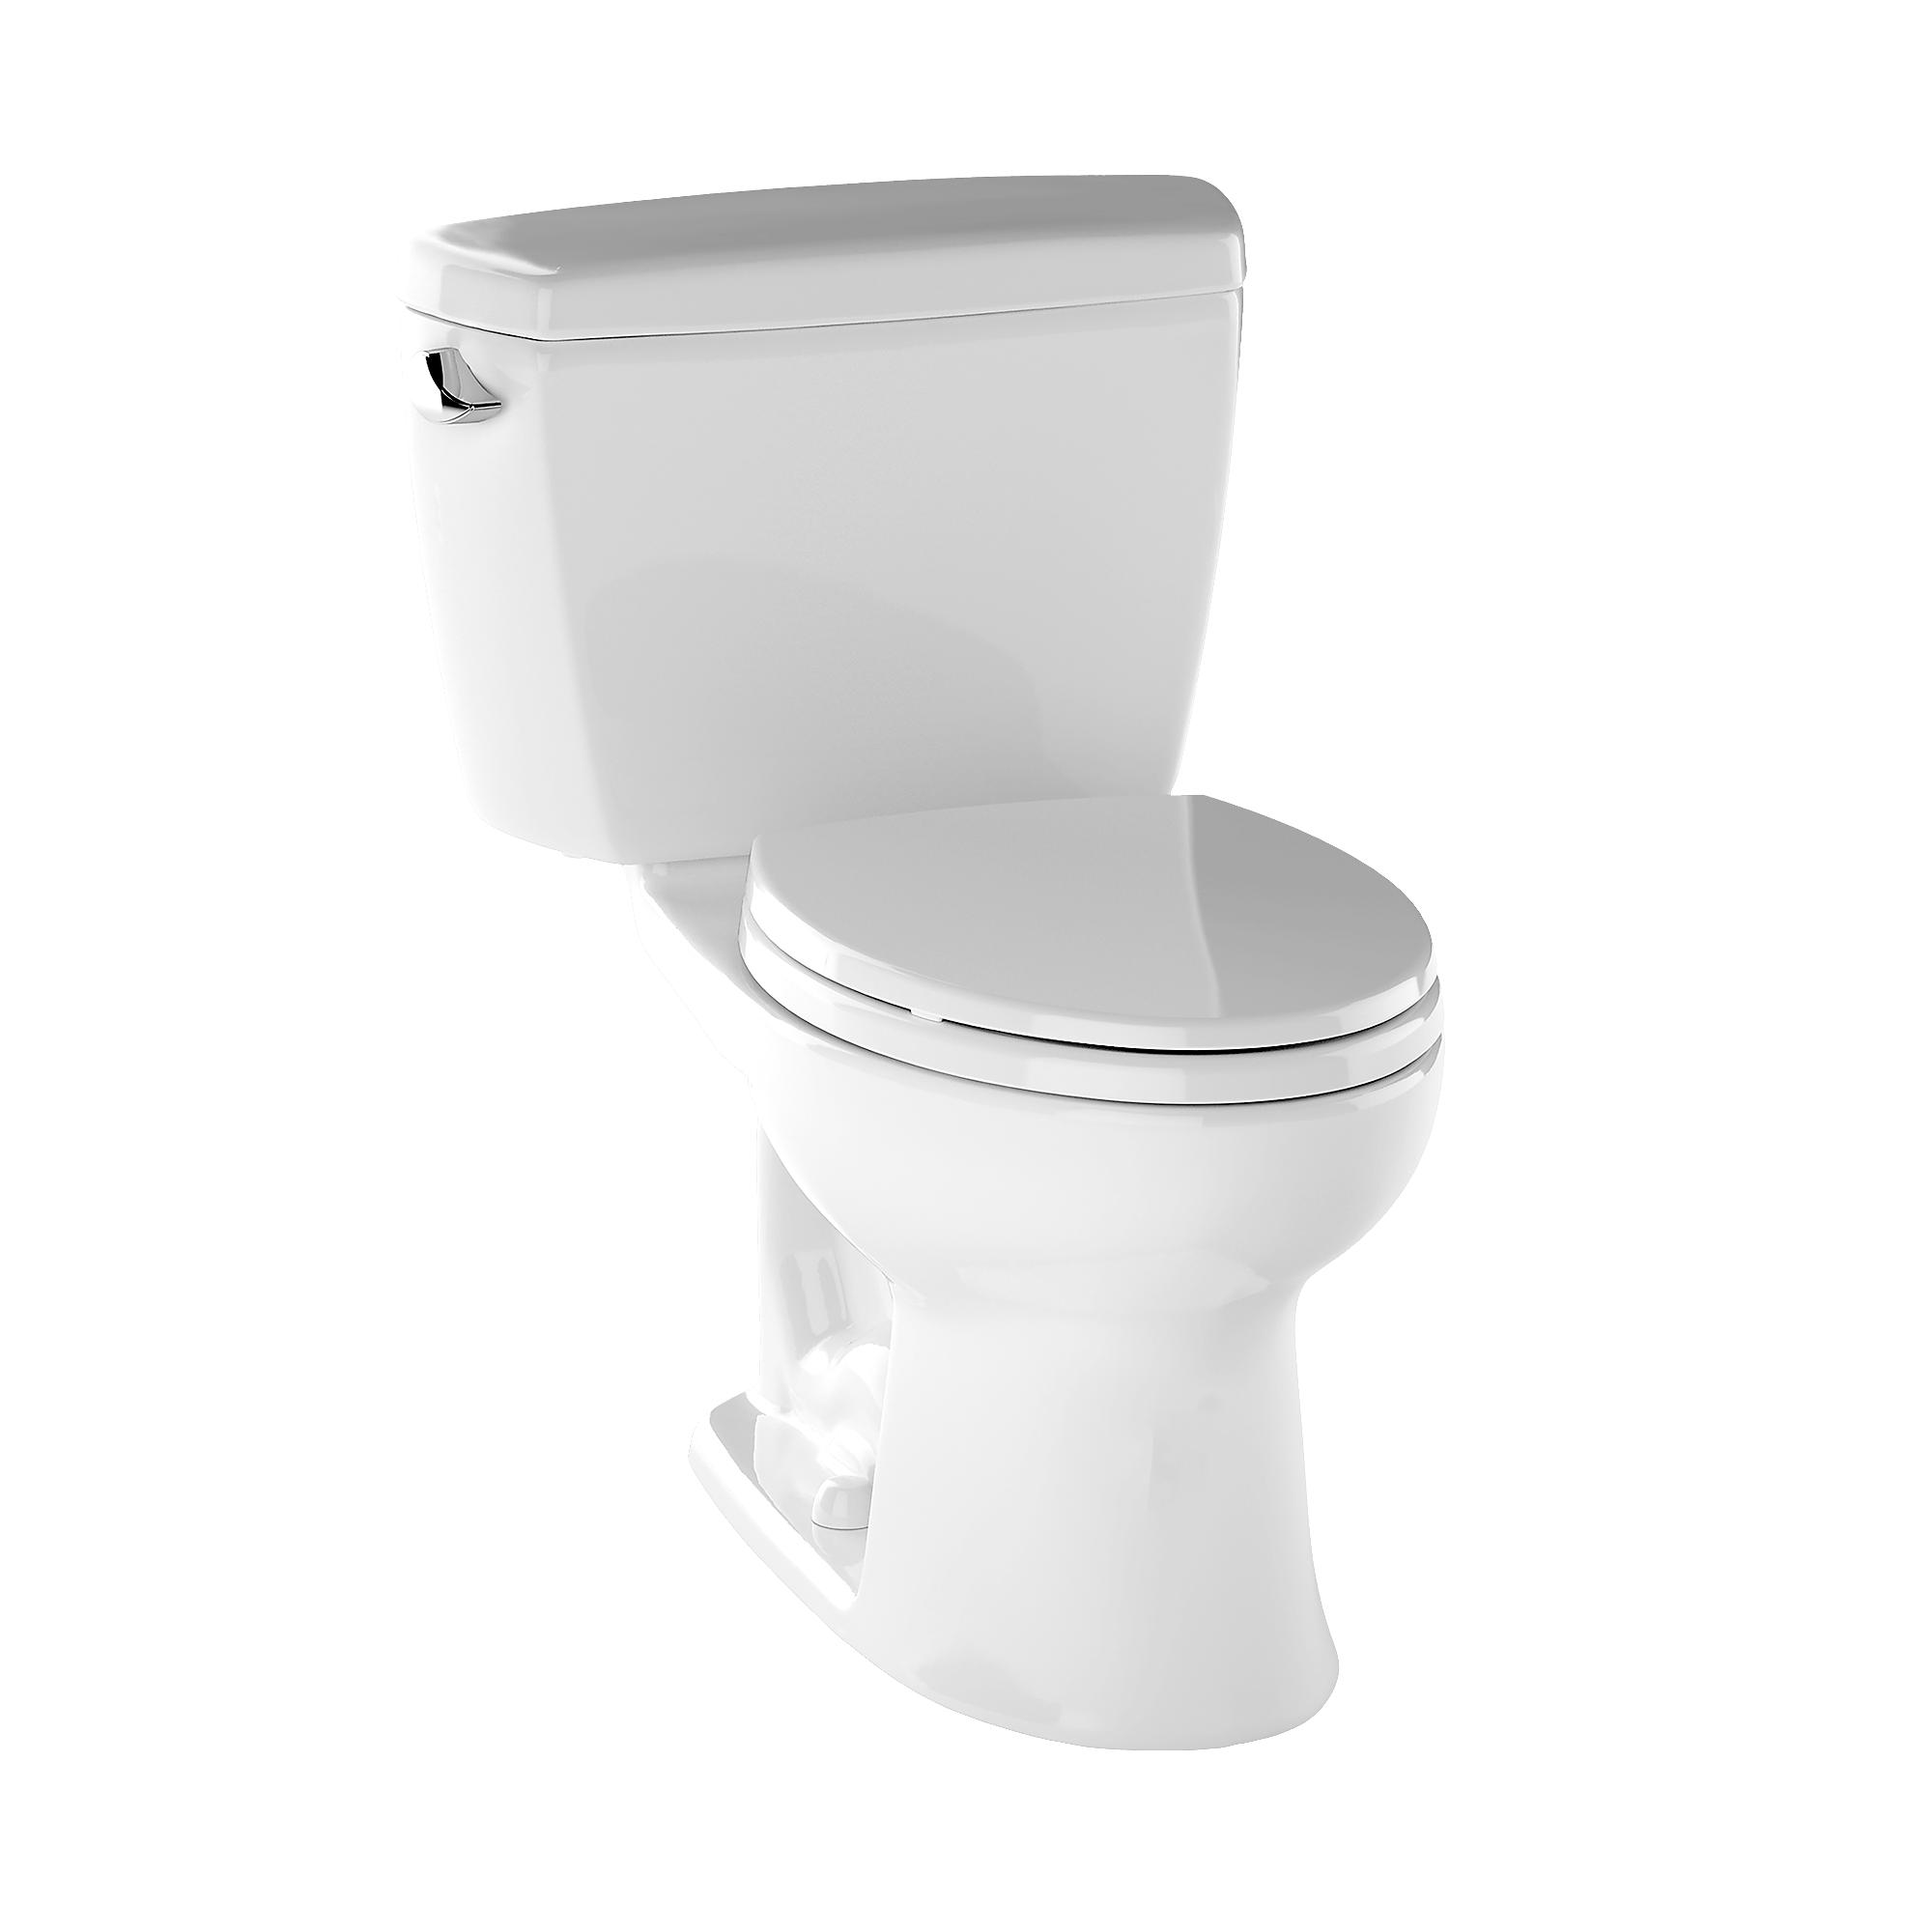 Cst744el 01 eco drake  two piece toilet  1 28 gpf  ada compliant  elongated bowl 0